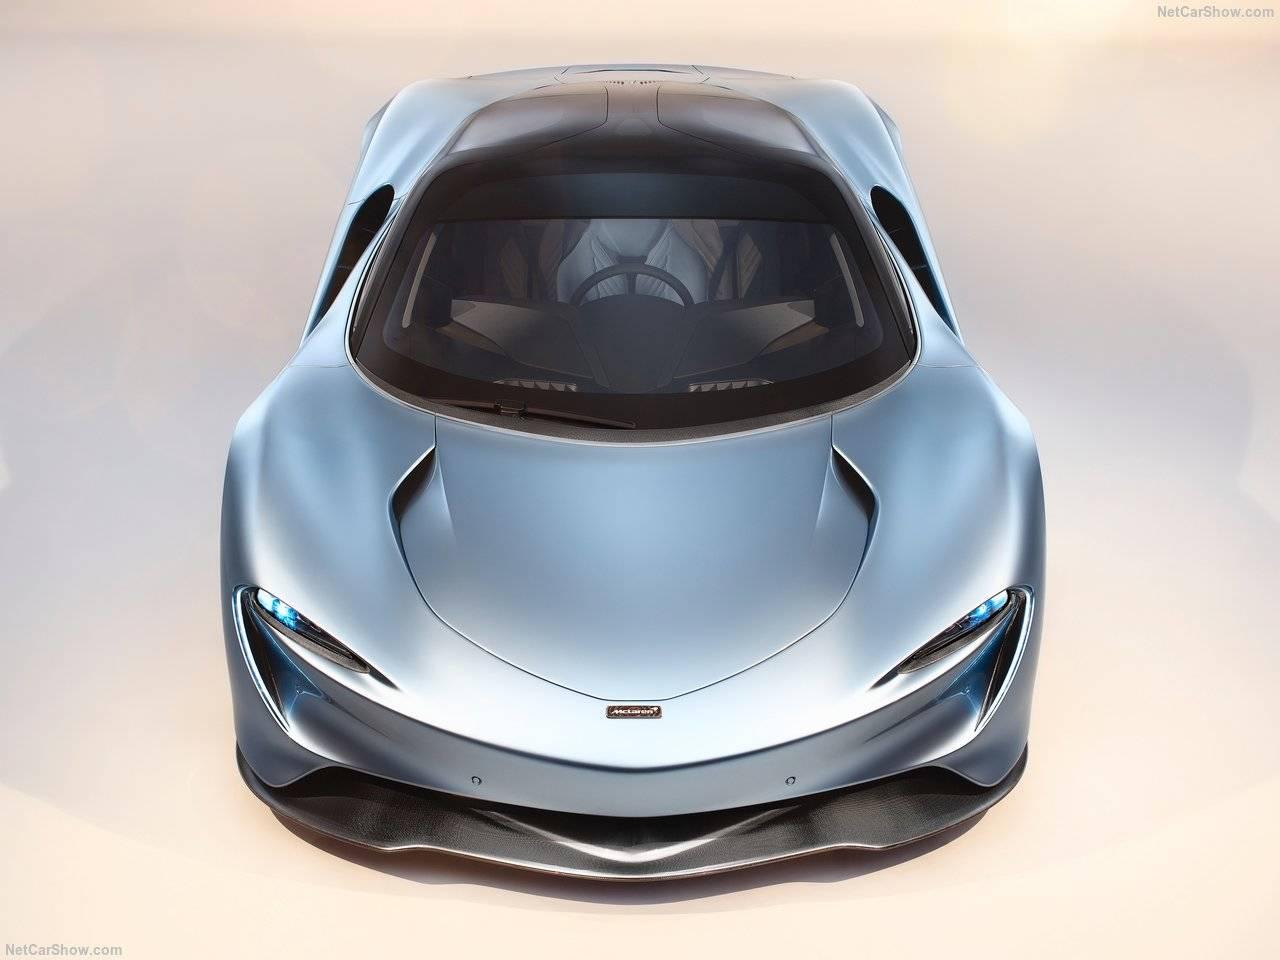 McLaren Speedtailが、公開されました!なんと最高速度403km/hというモンスターカーに!!!